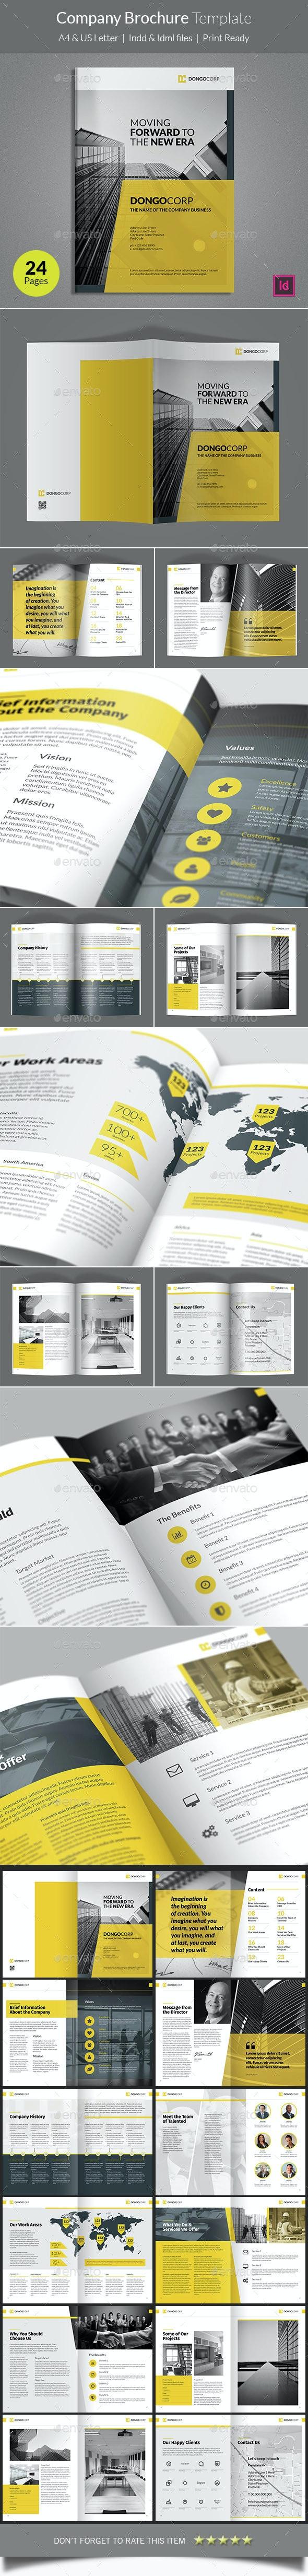 Company Brochure Template - Corporate Brochures